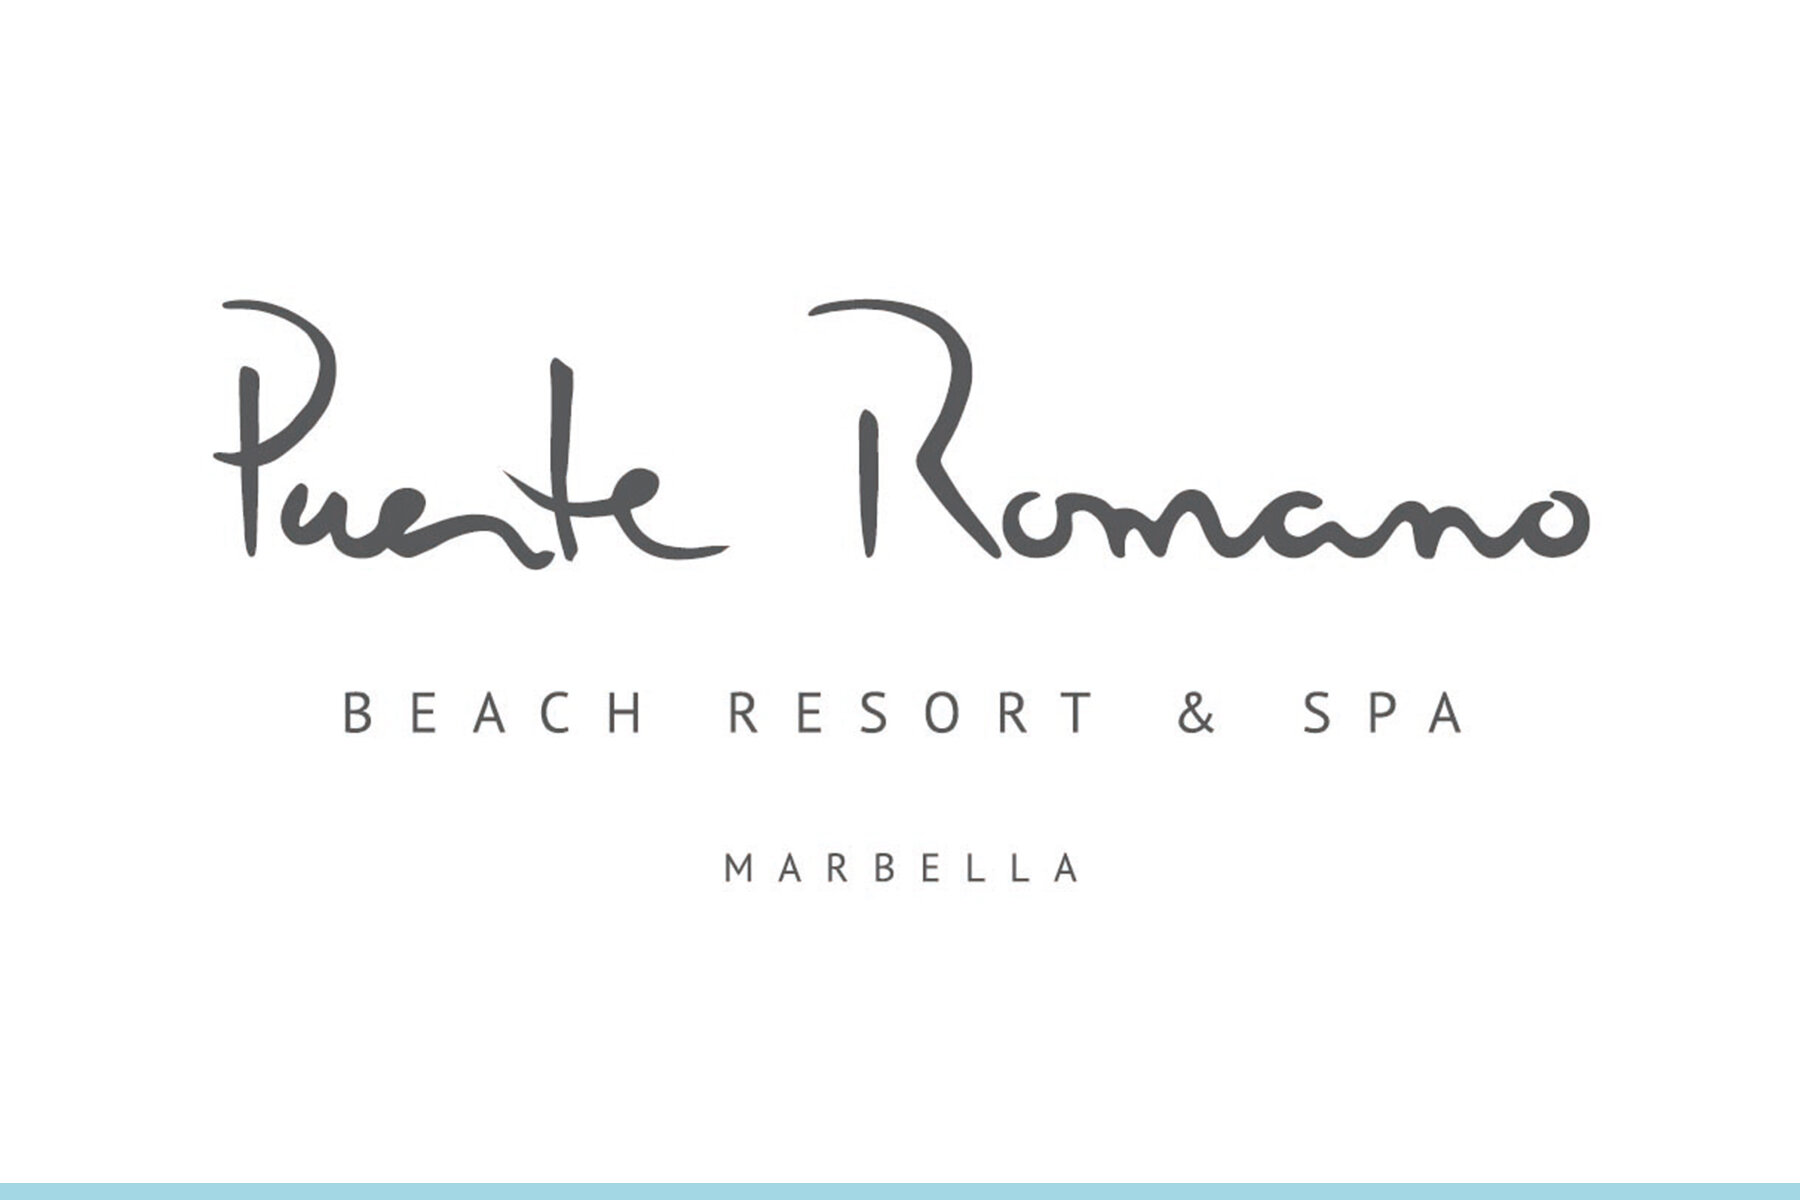 Puente Romano Partners page.jpg